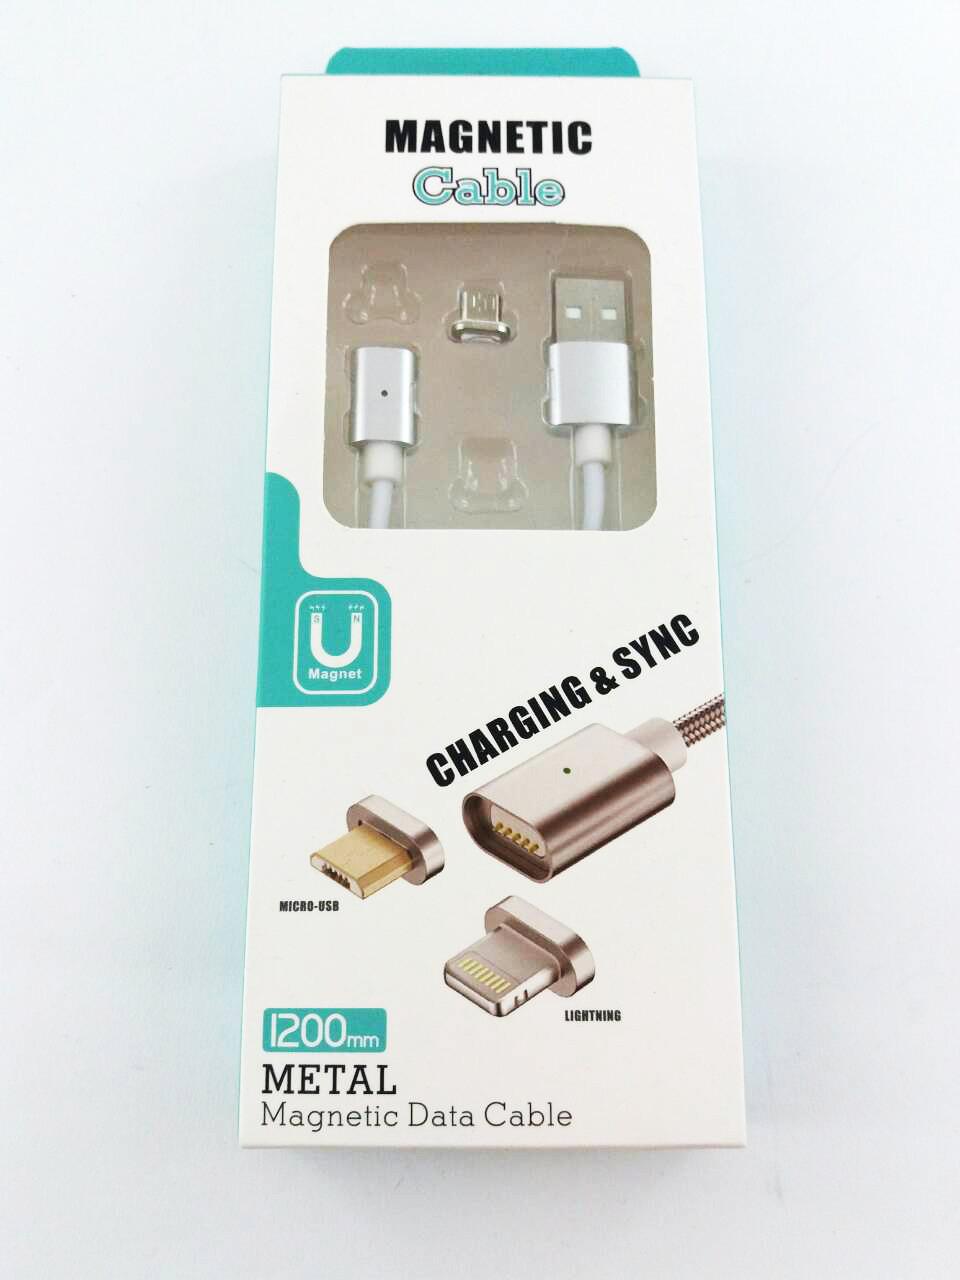 Магнитный кабель Magnetic Data Cable DM-M12 (разъем Micro USB) (н)